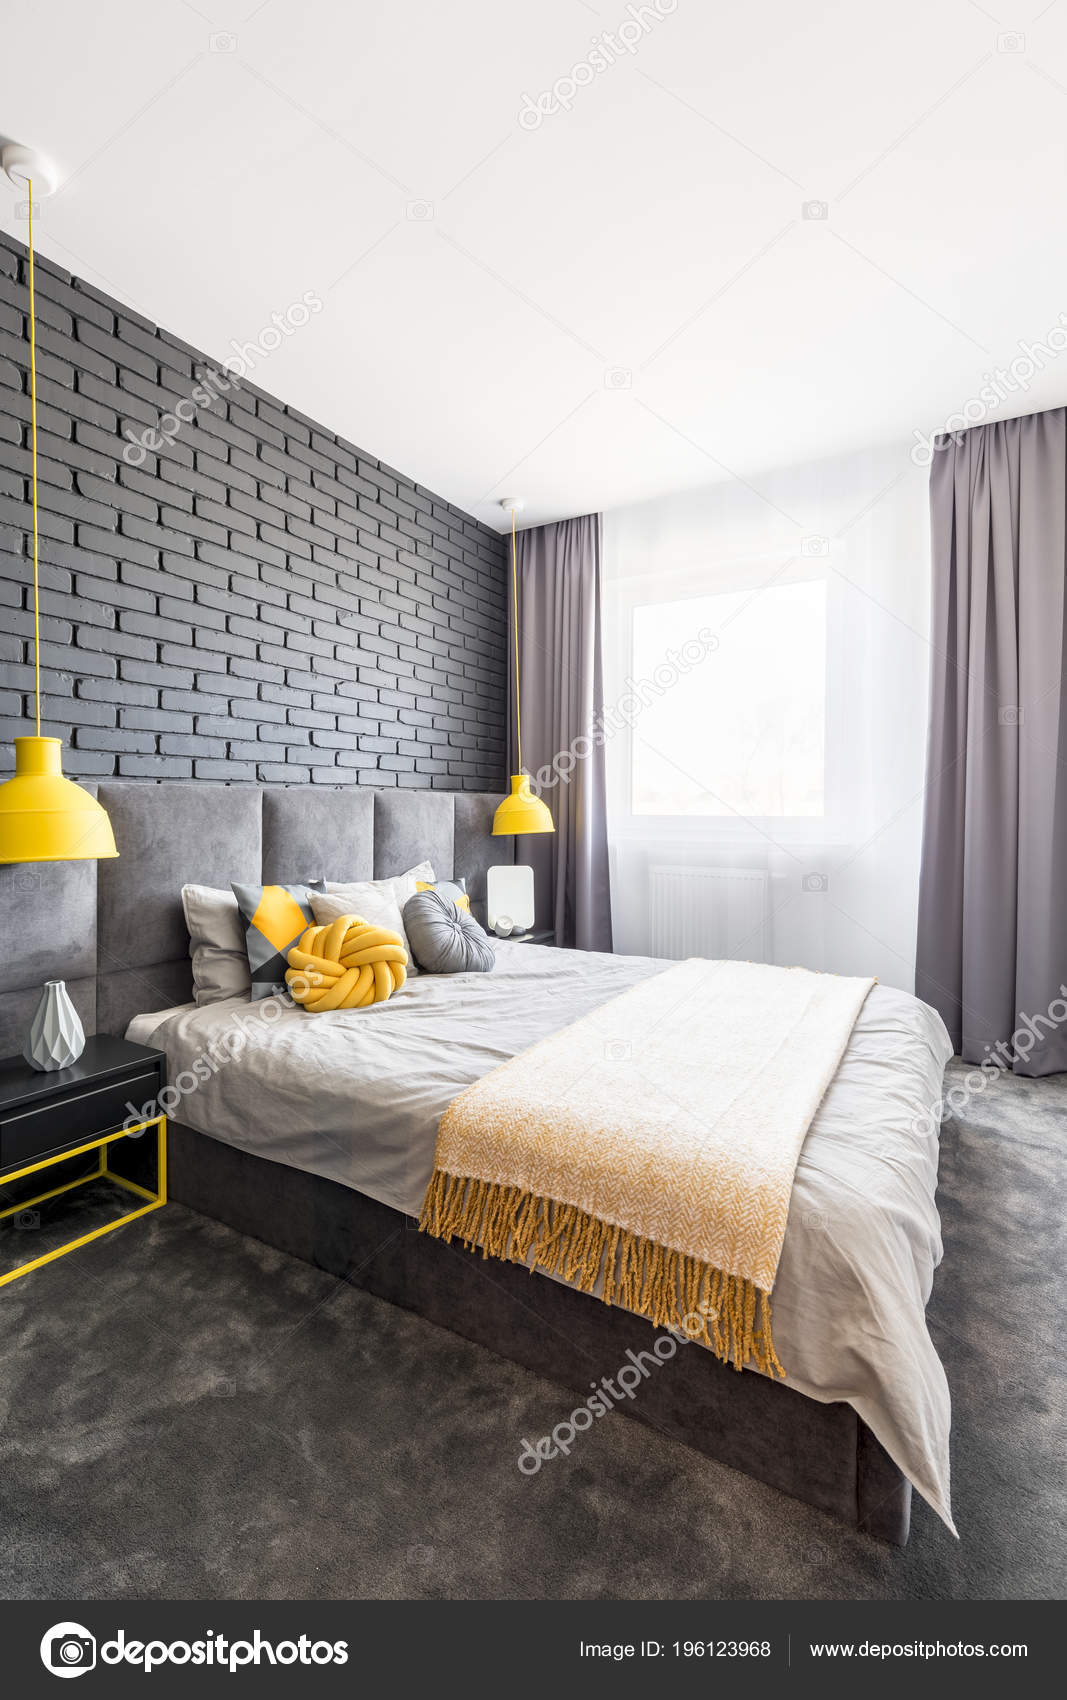 Modern Gray Yellow Bedroom Interior Comfy Bed Standing Black Brick Stock Photo C Photographee Eu 196123968